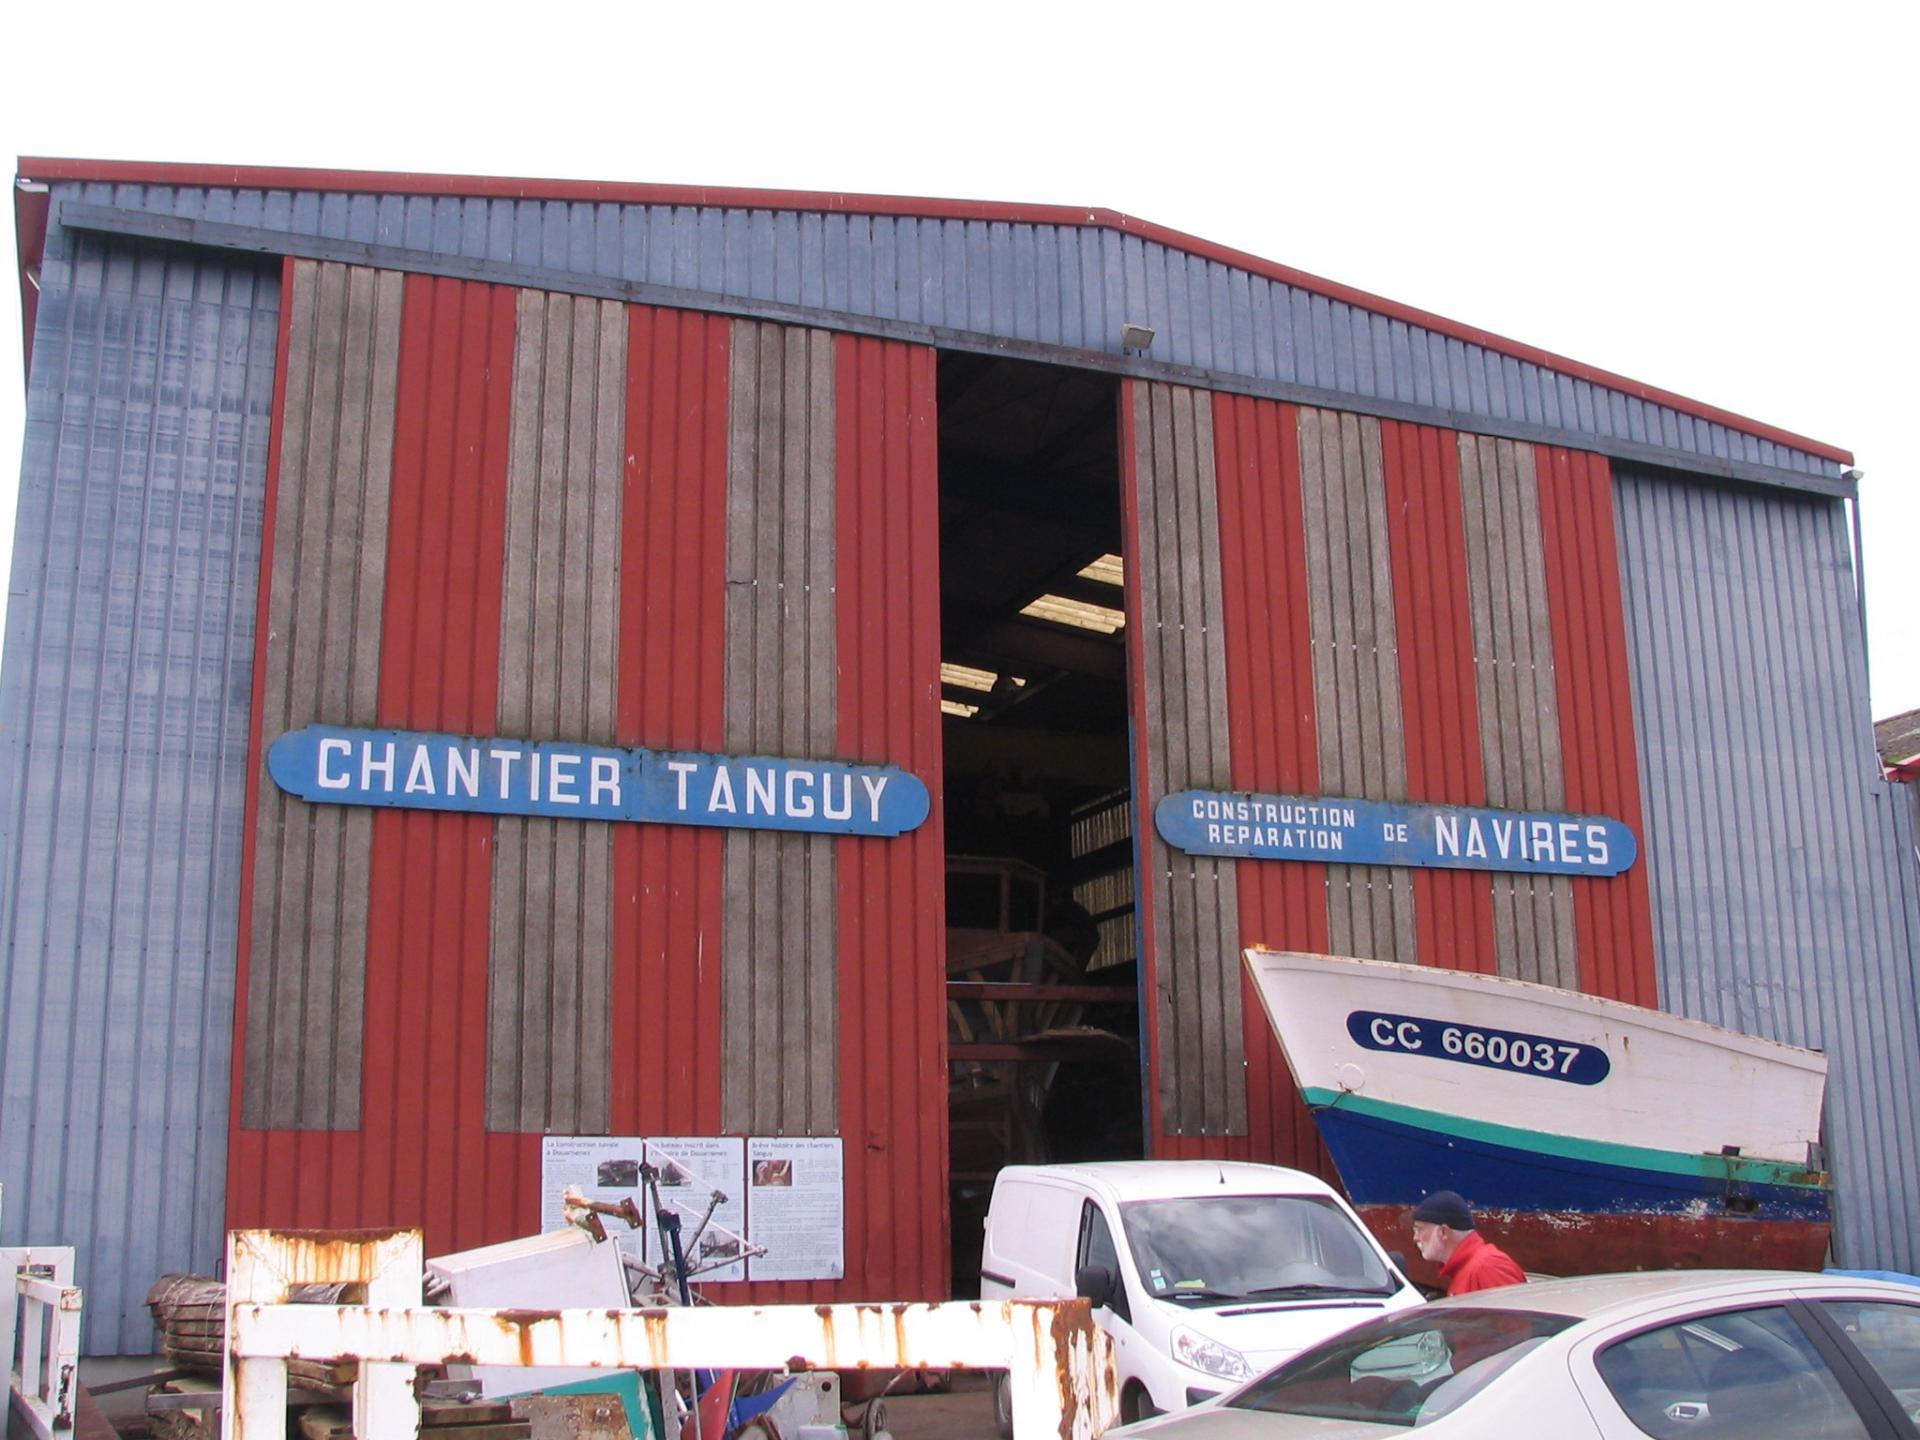 Chantier tanguy